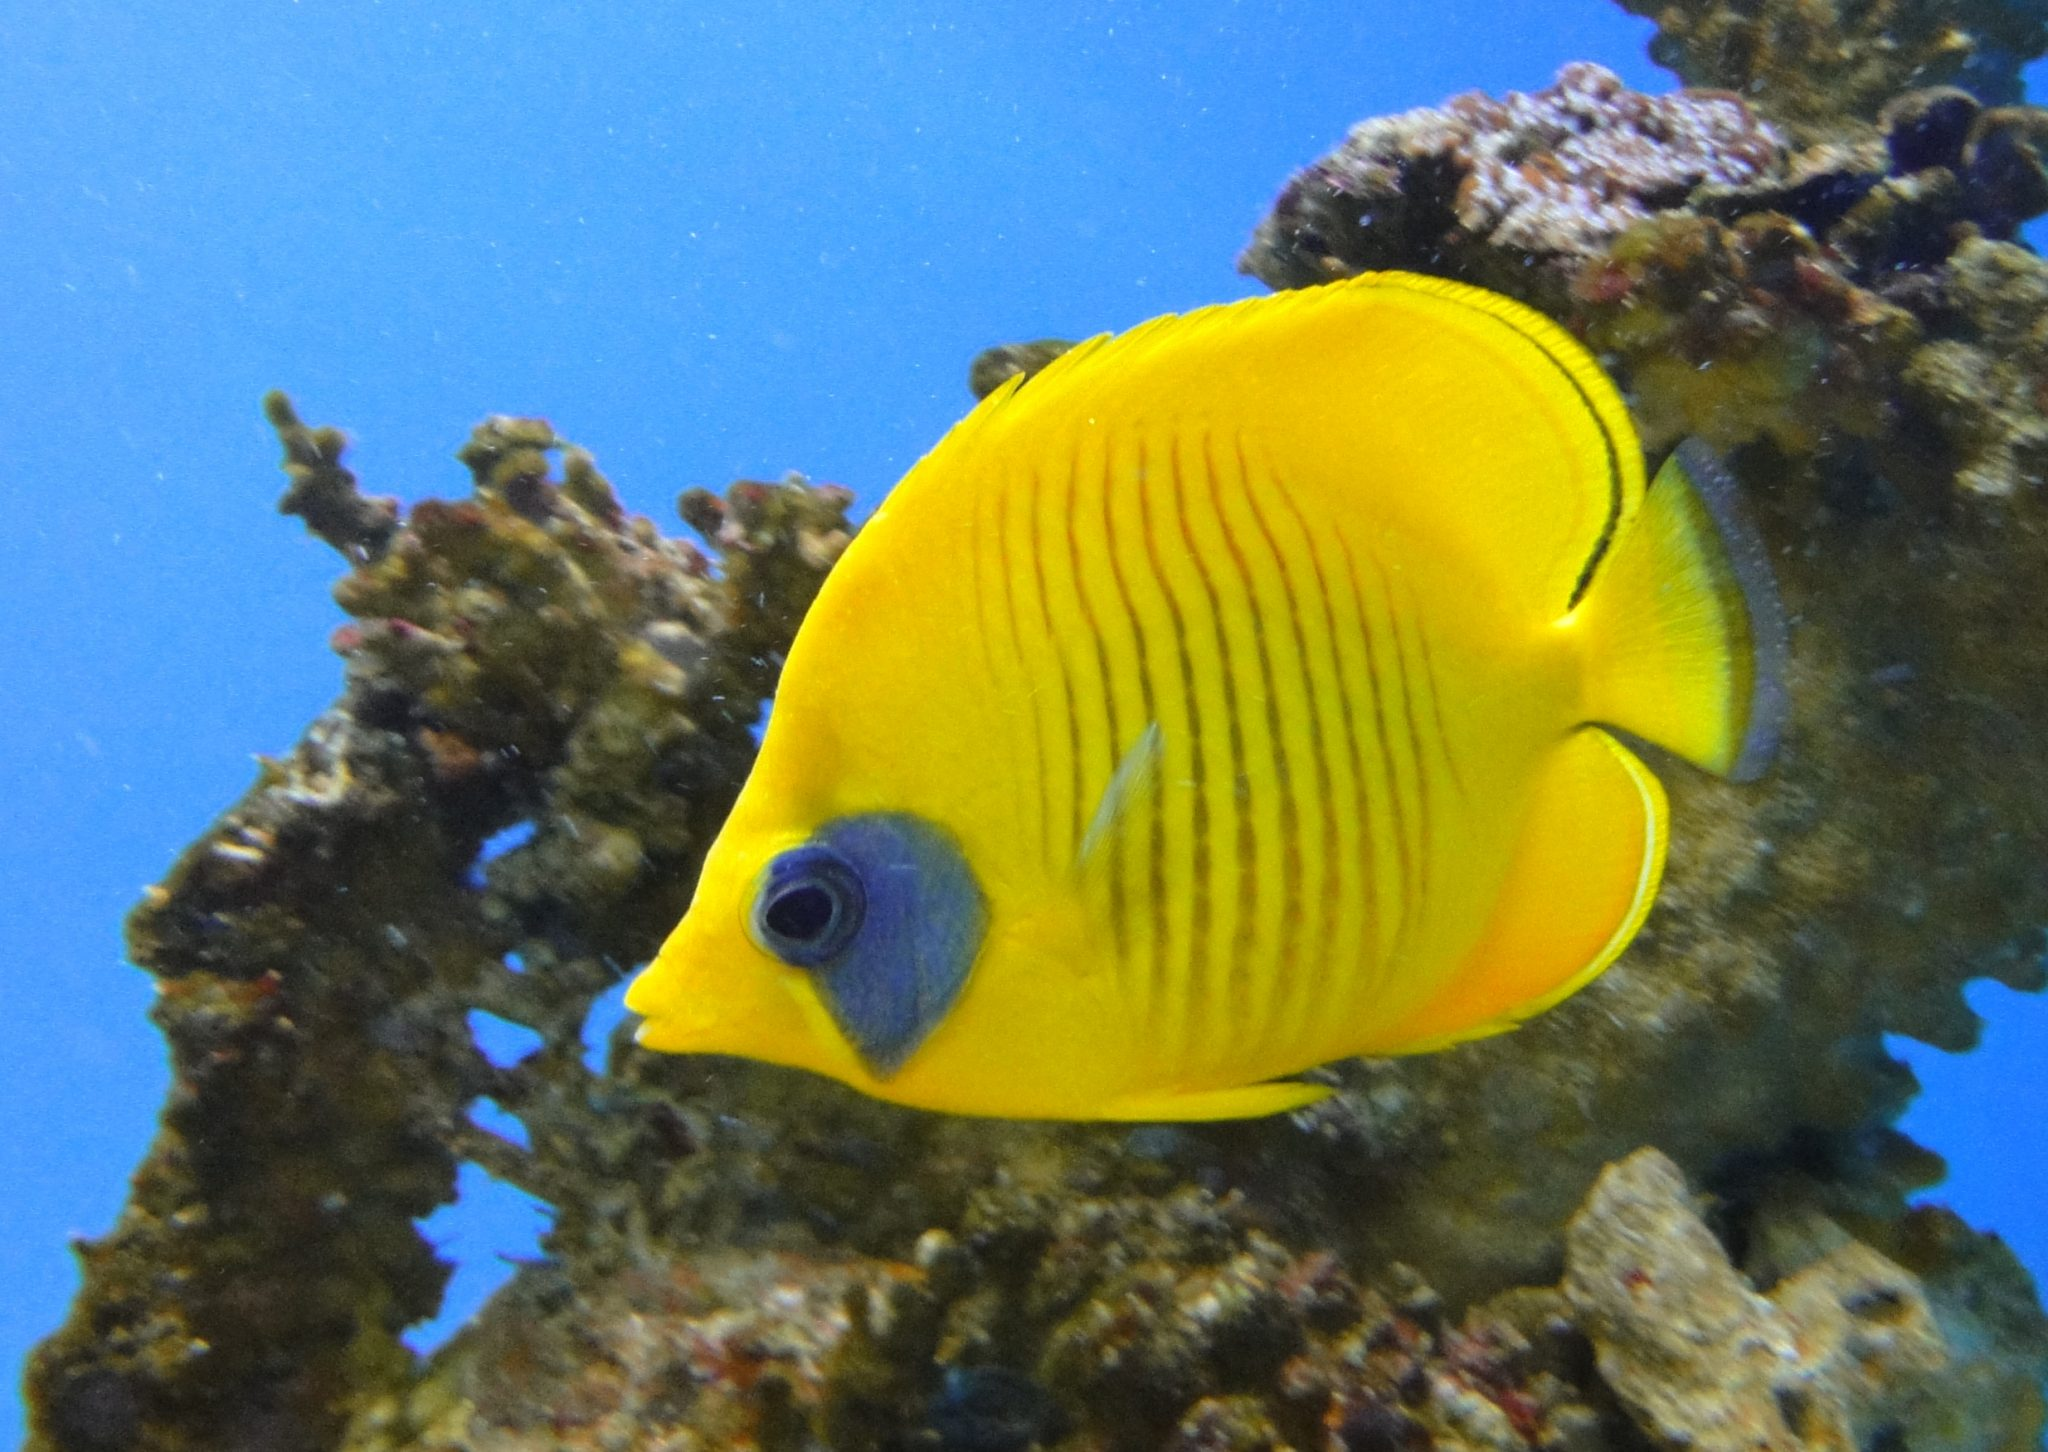 Addis Butterflyfish, Bluecheek Butterflyfish, Bluecheek Butterflyfish, Golden Butterflyfish, Redlined Butterflyfish, Yellow Butterflyfish